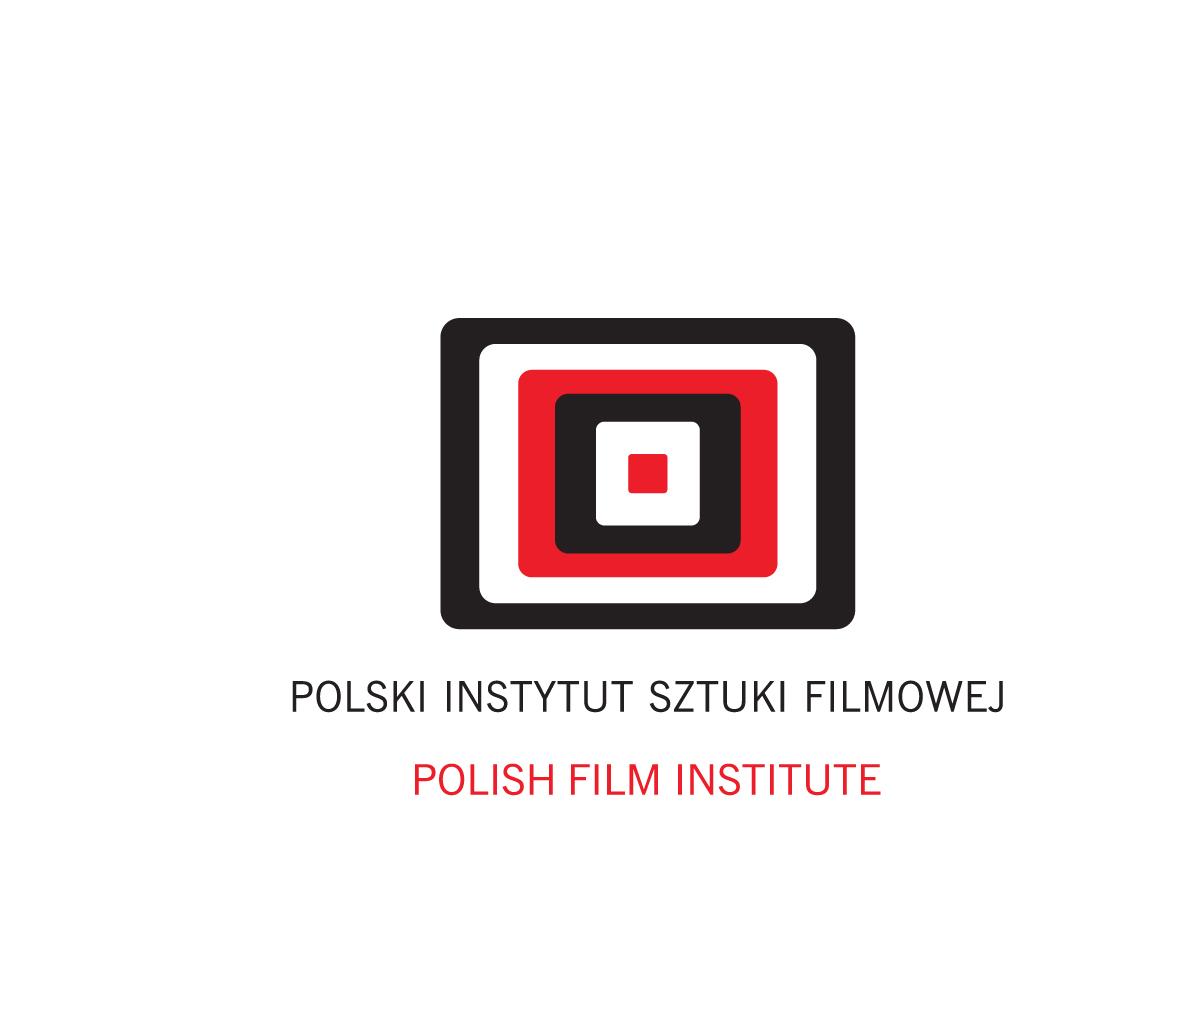 Polski_Instytut_Sztuki_Filmowej_logo